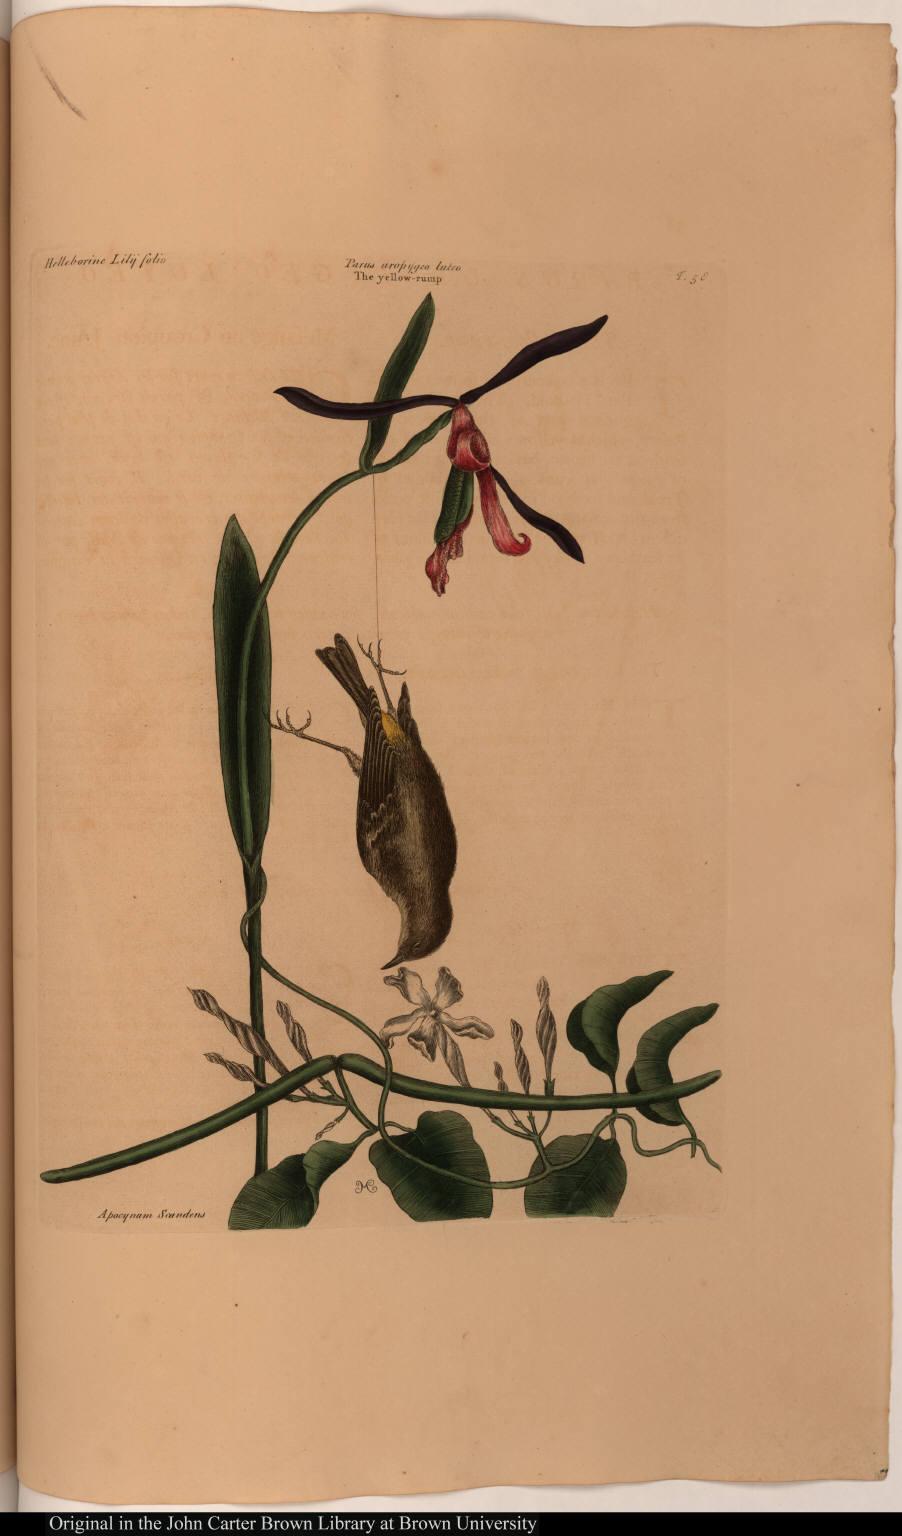 [The Yellow-rump.] Helleborine Lilij folio; Parus uropygeo luteo; The yellow-rump; Apocynum Scandens